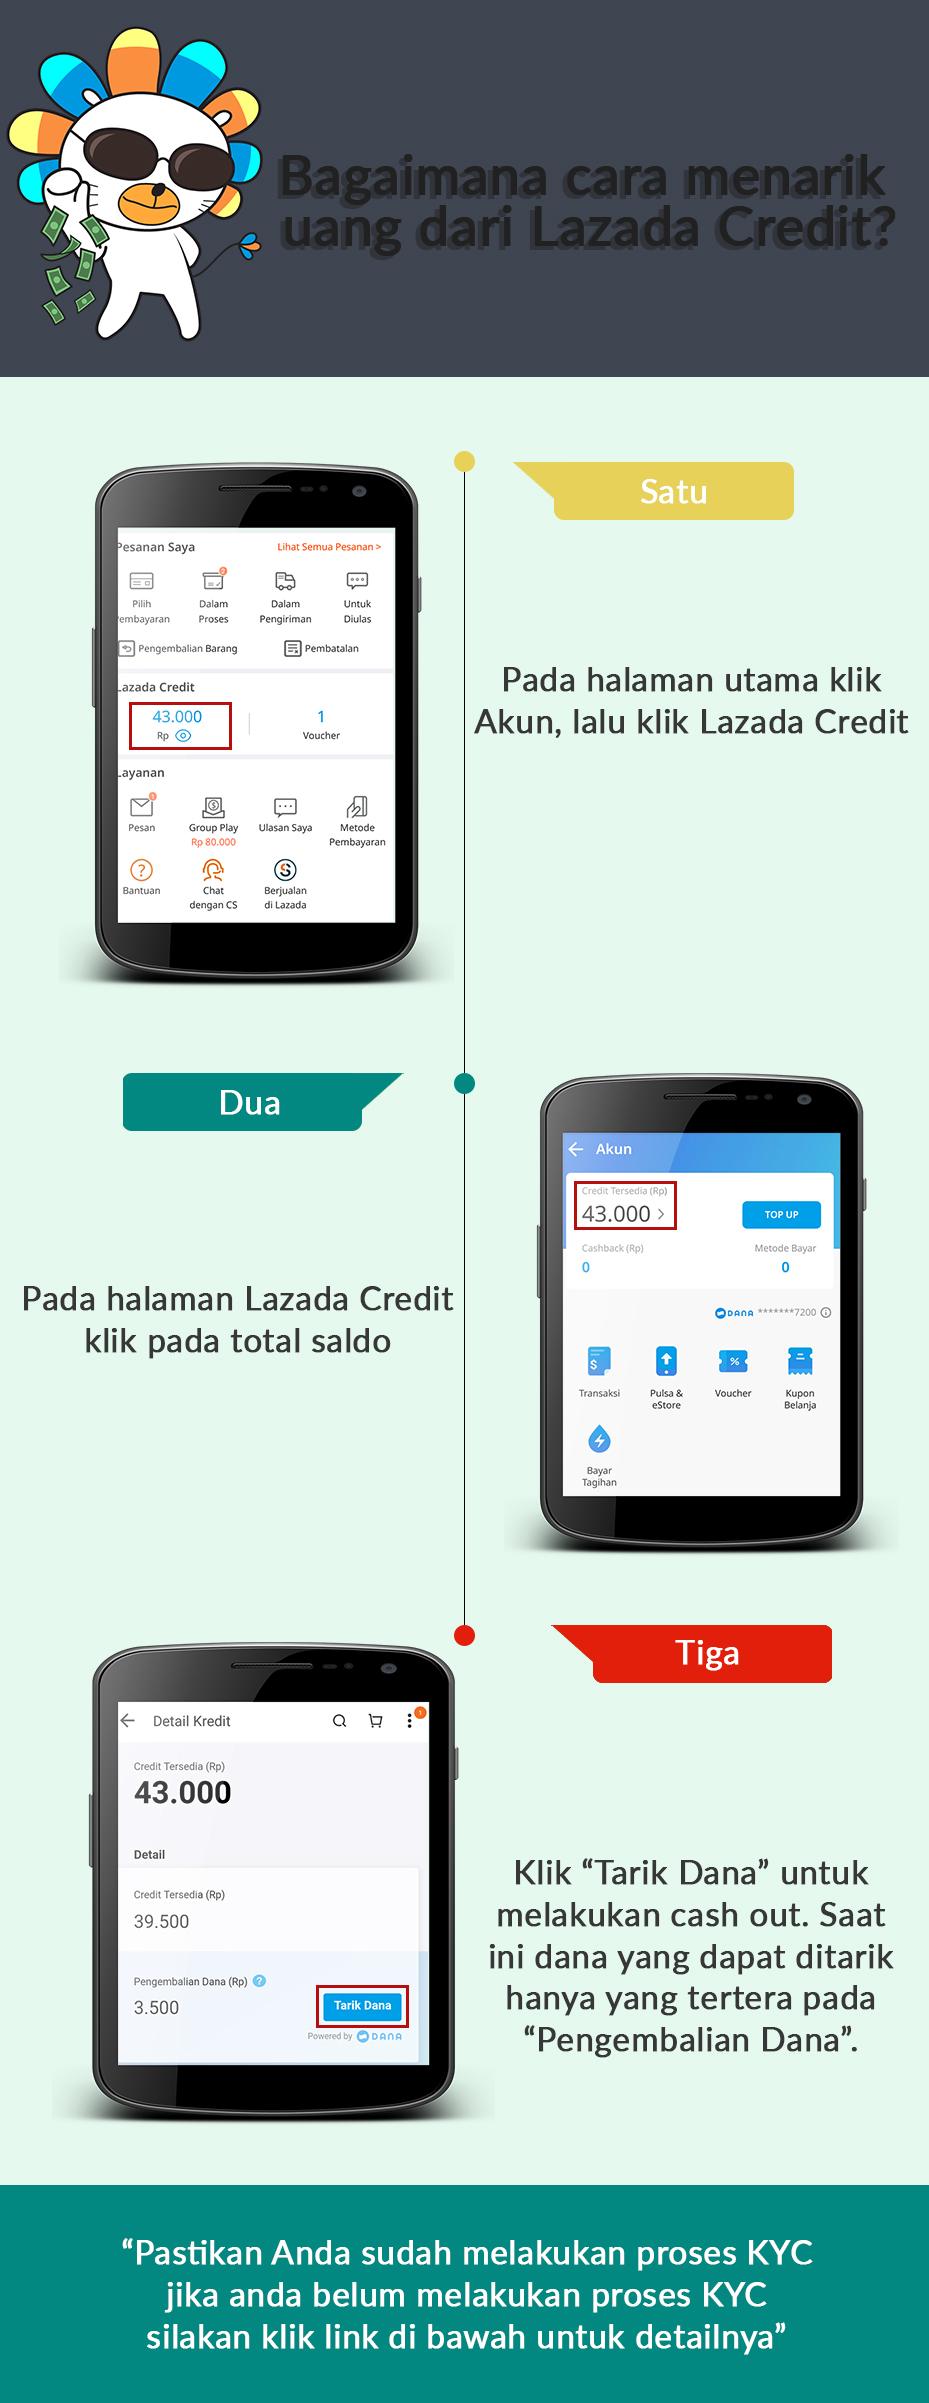 Bagaimana Cara Melakukan Pengembalian Dana Melalui Lazada Credit